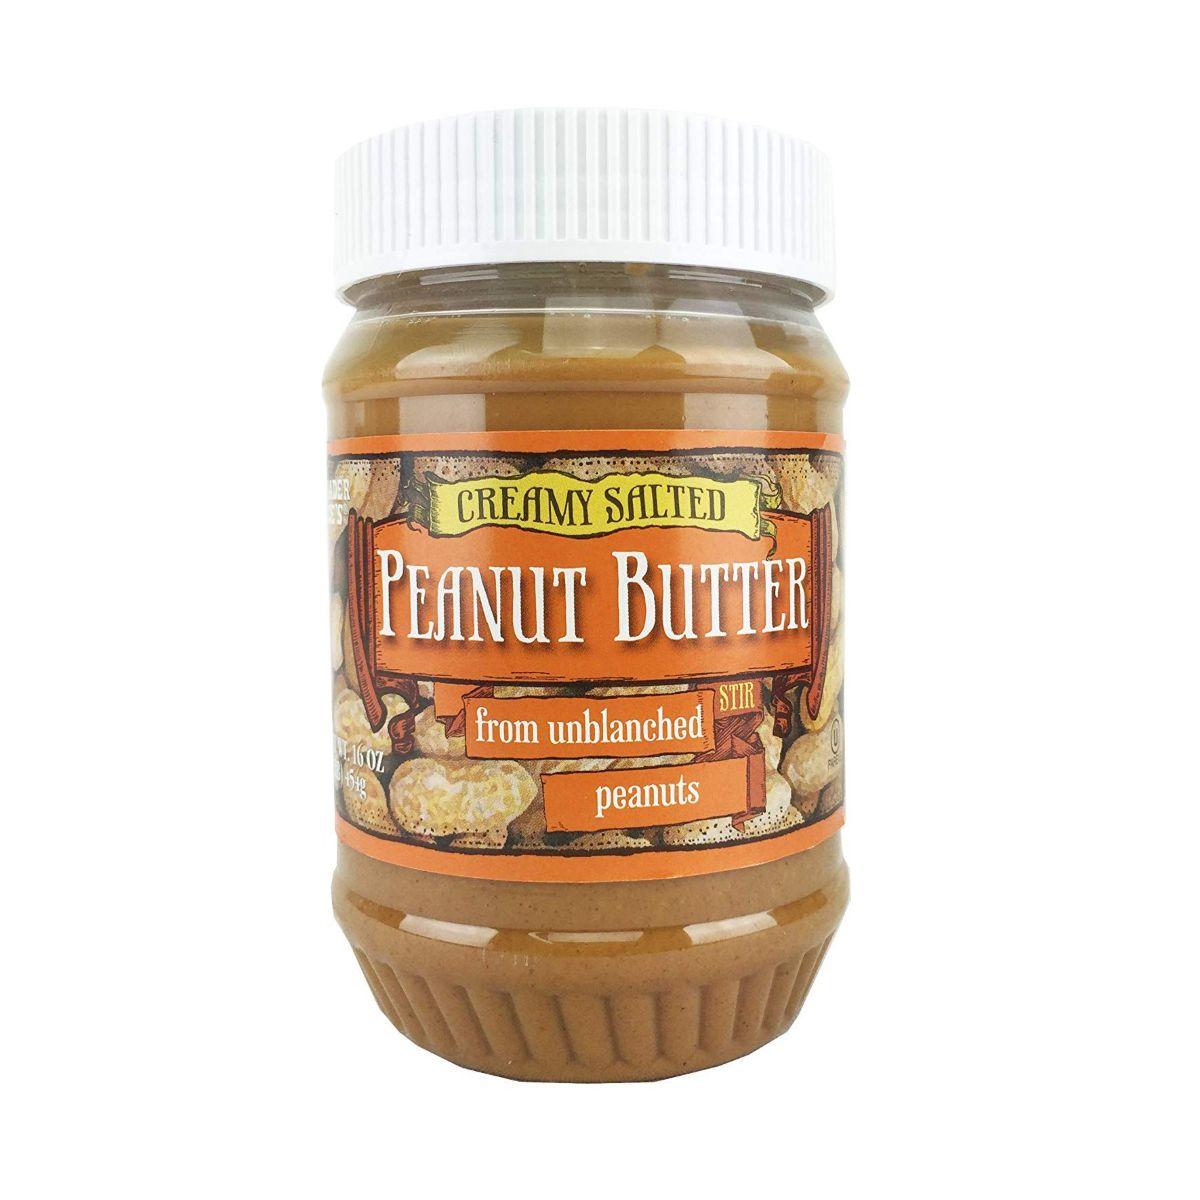 Trader Joe's Creamy Salted Stir Peanut Butter